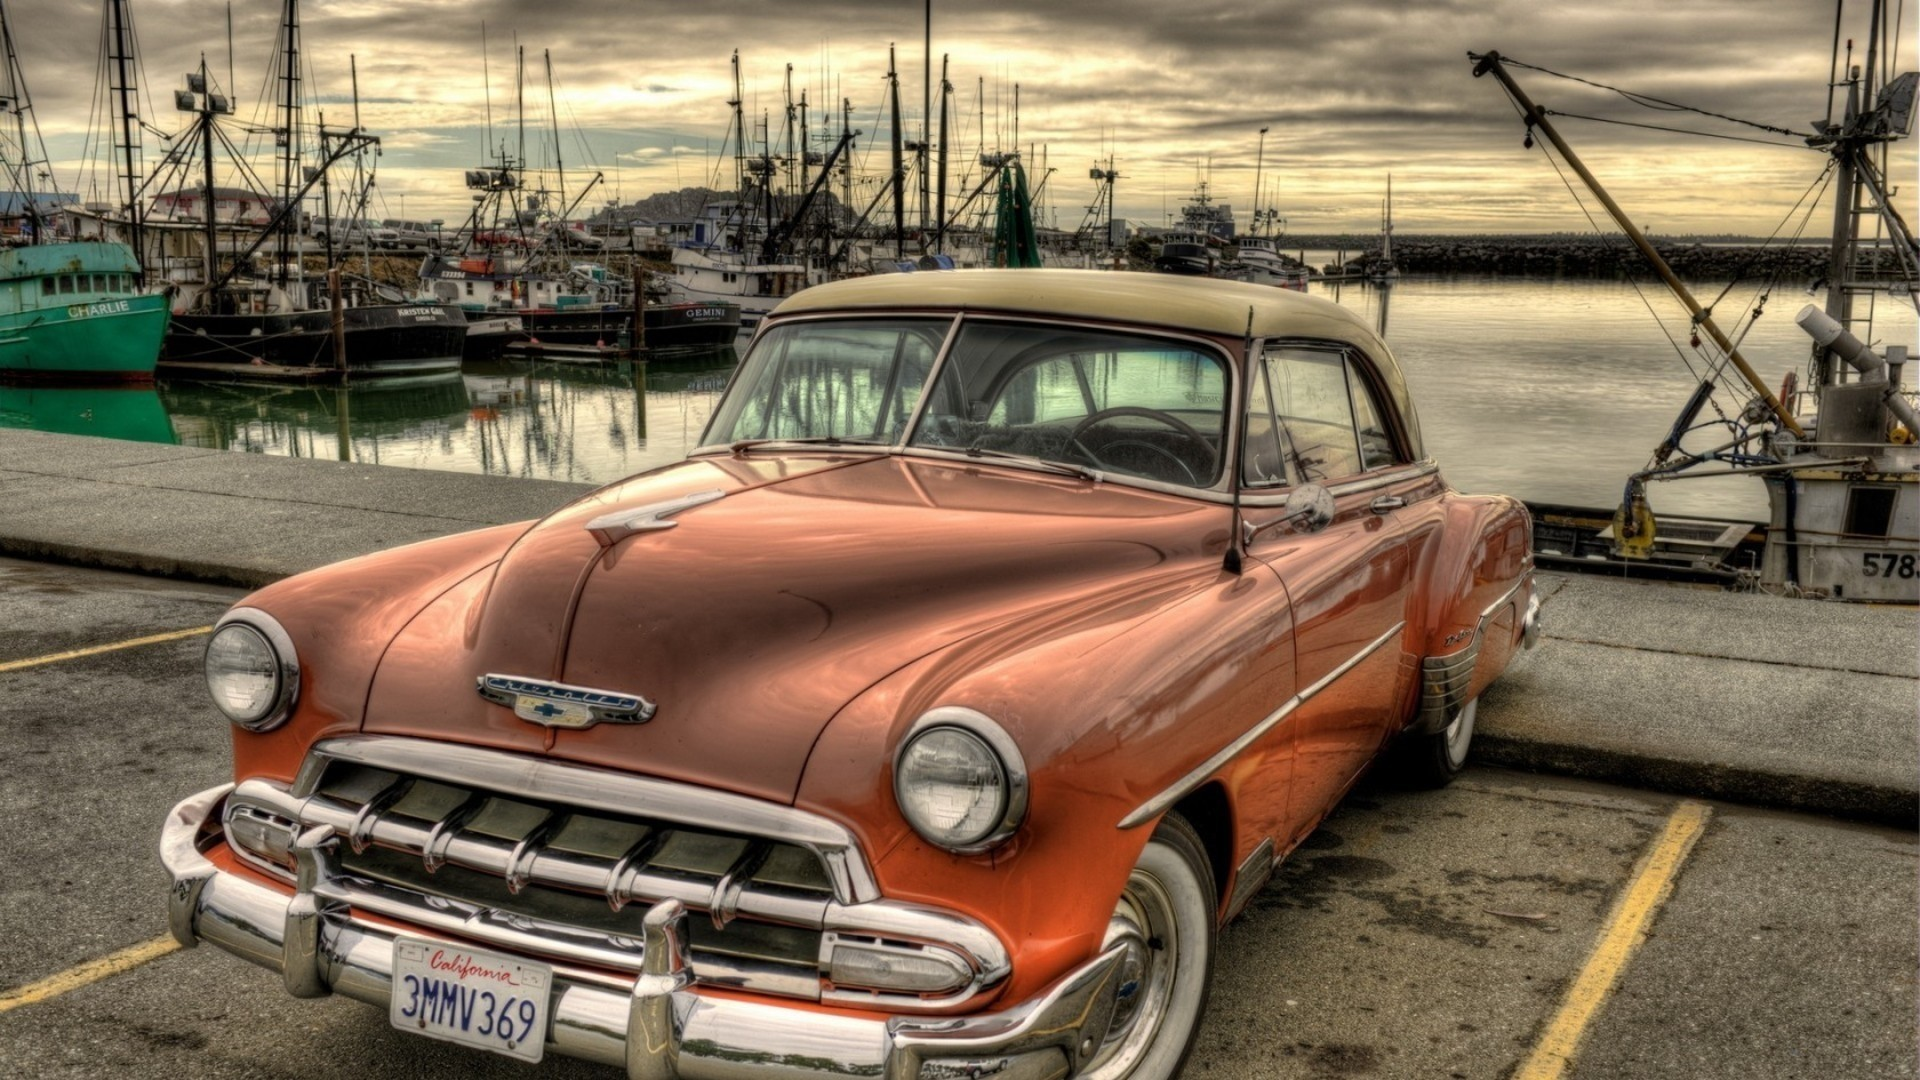 Classic Car Wallpaper Picture hd